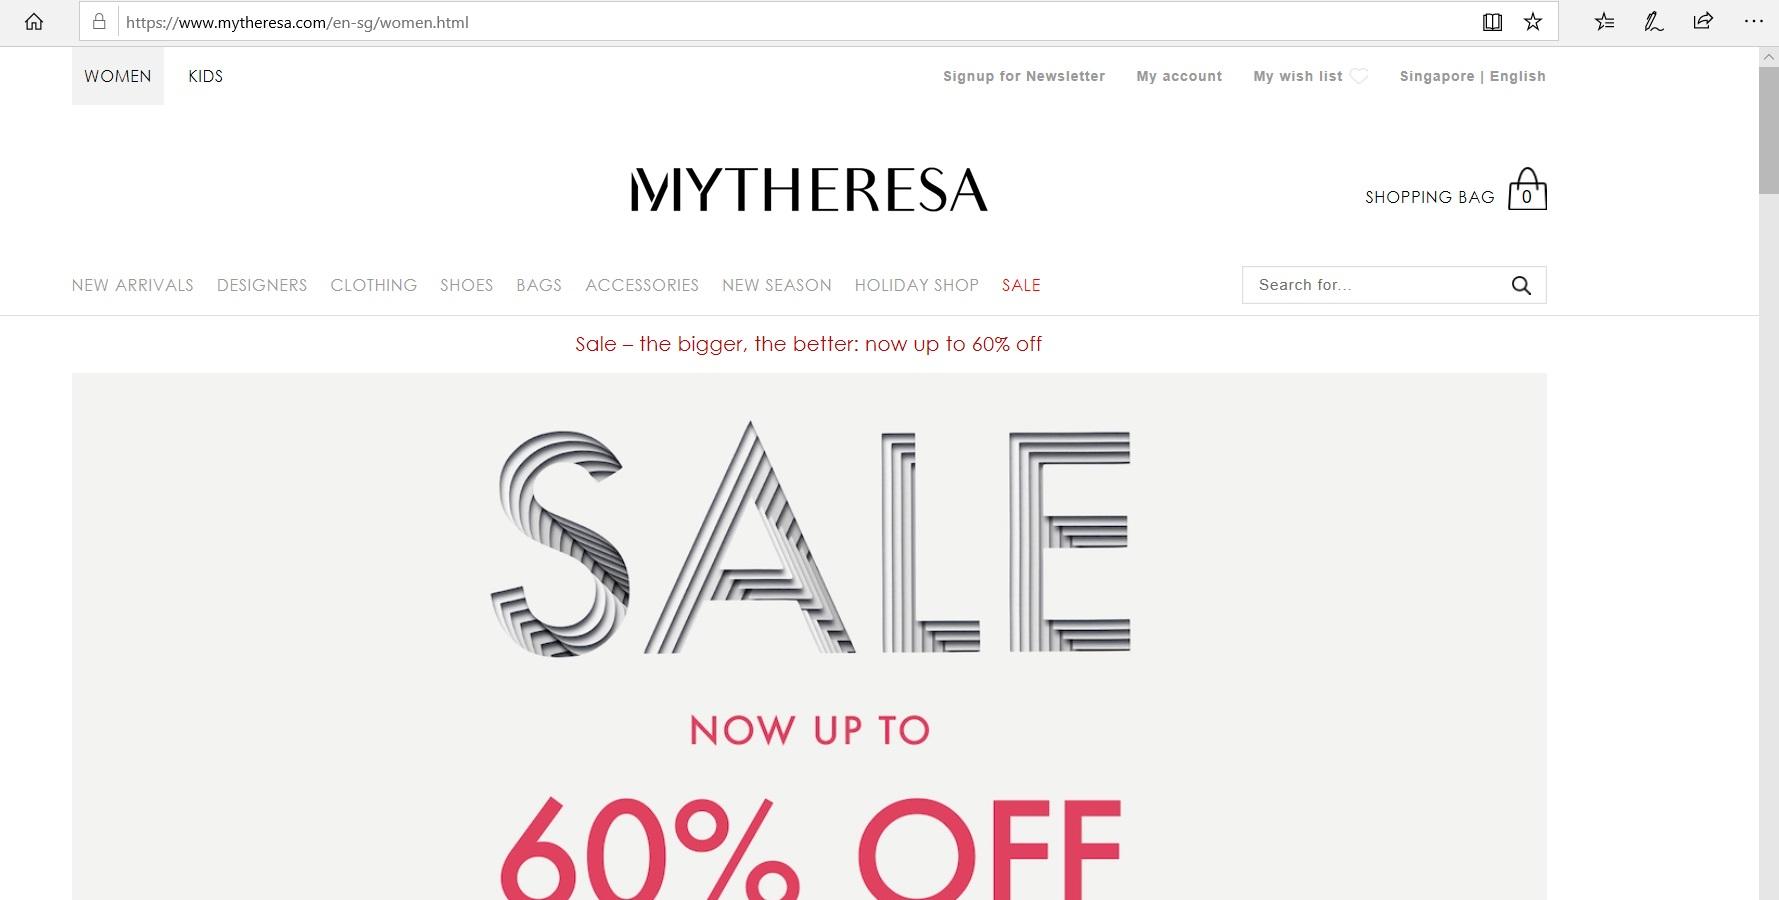 Mytheresa website homepage.